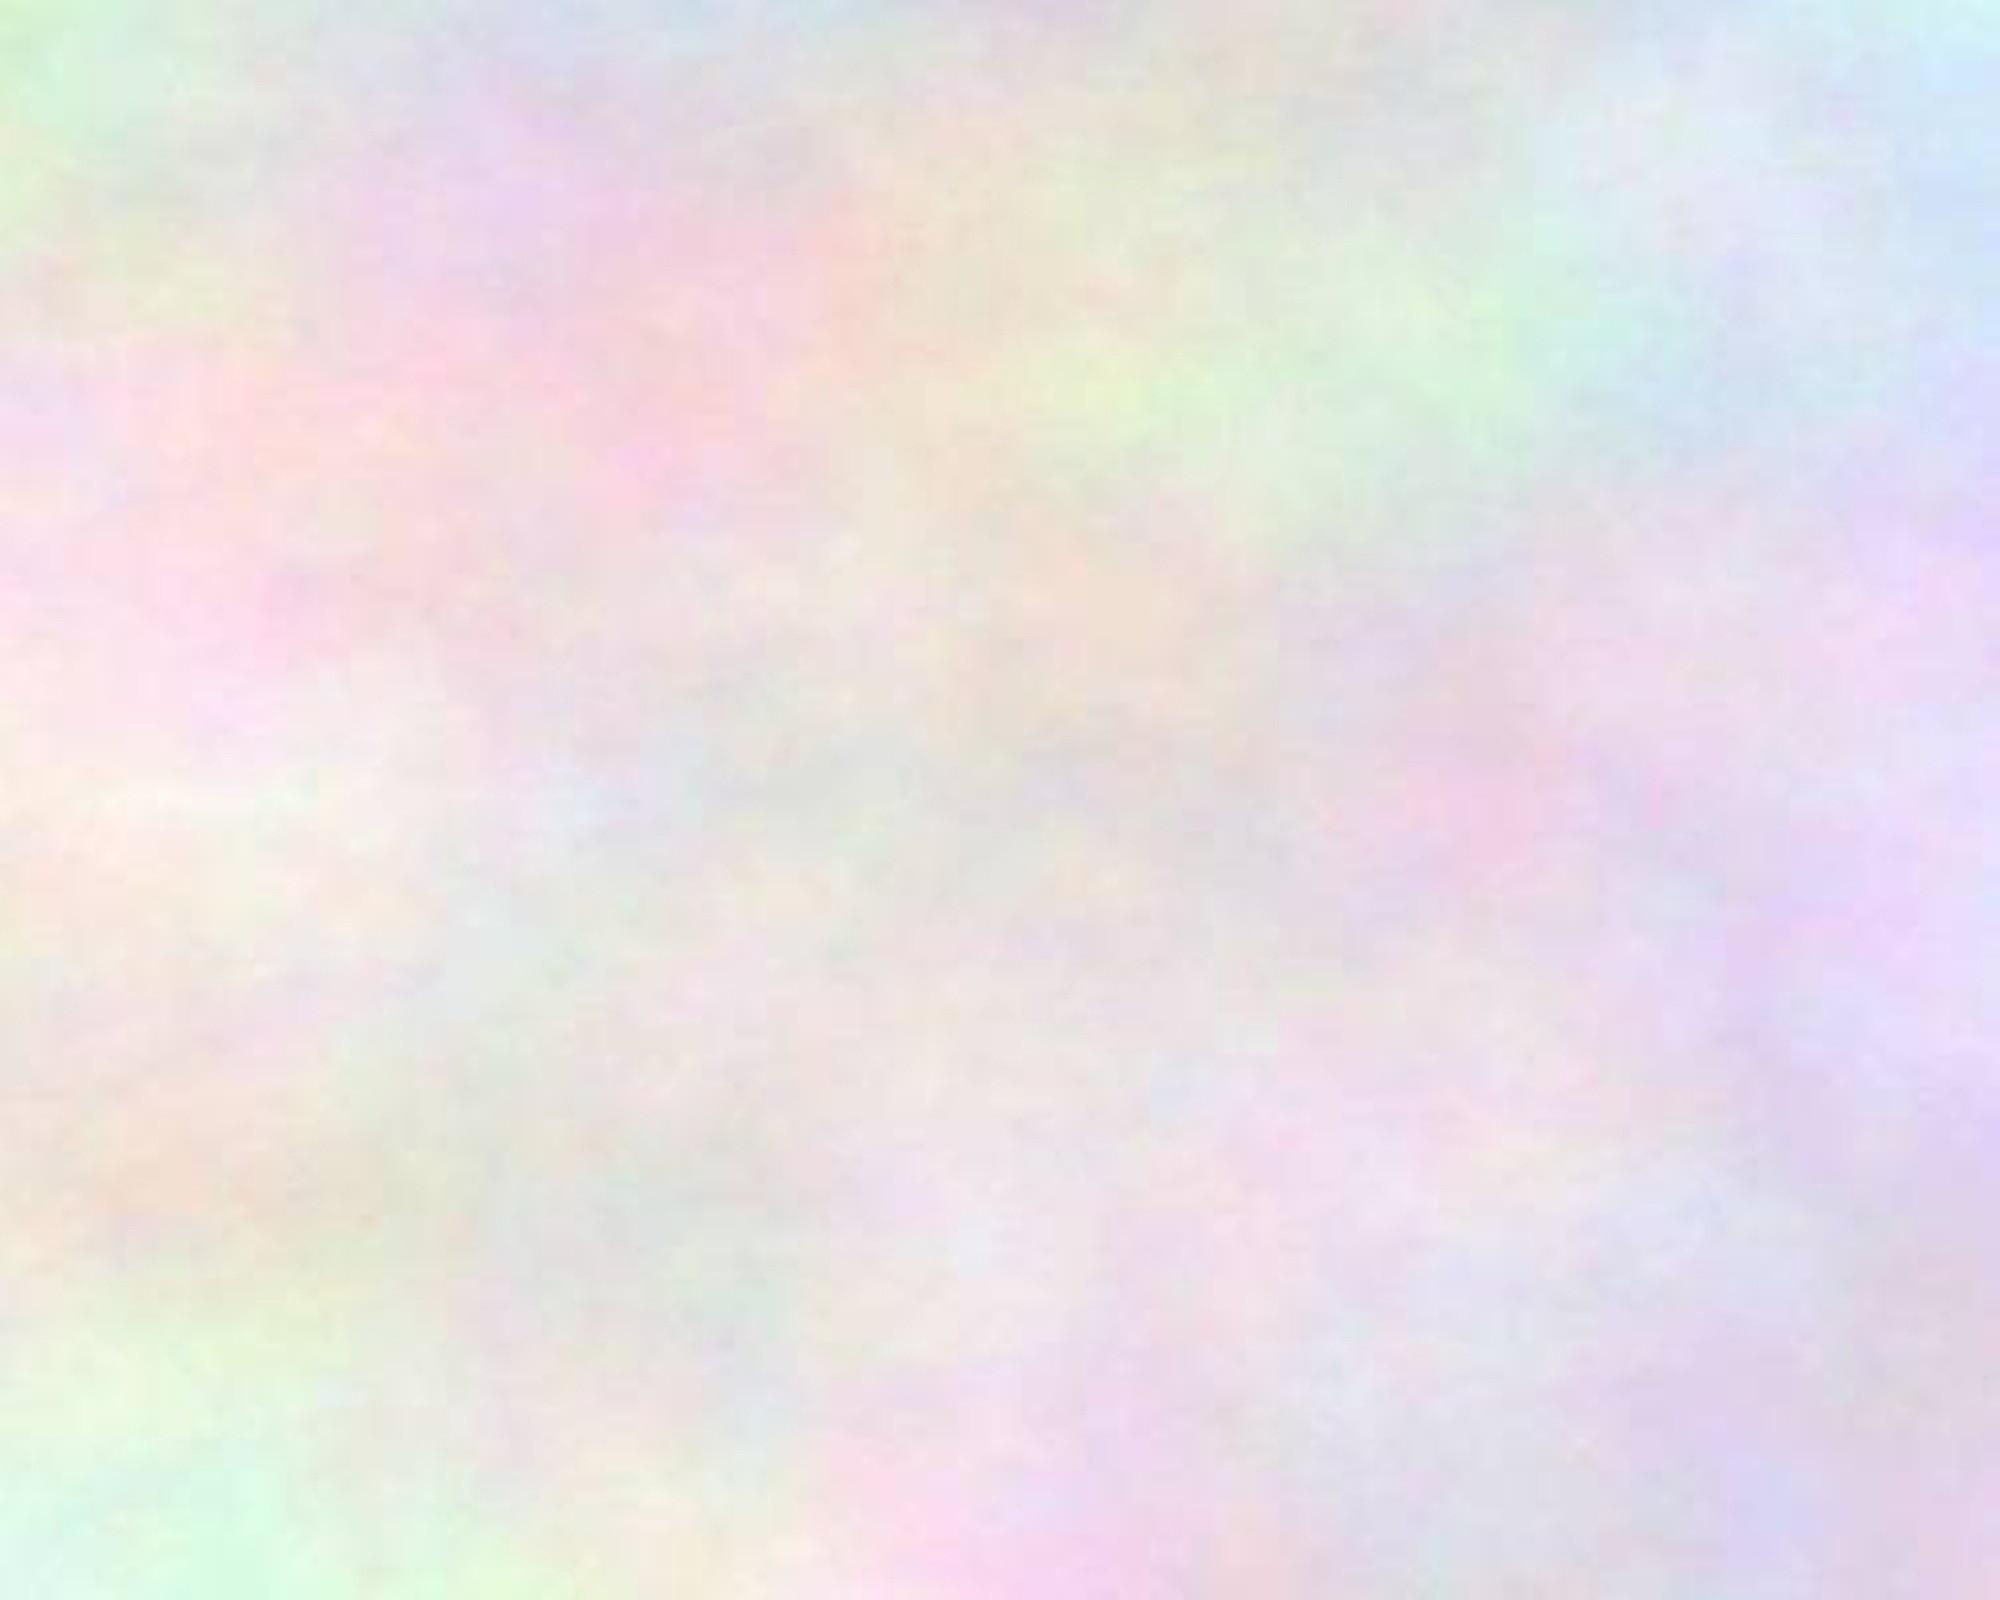 pastel colors wallpaper